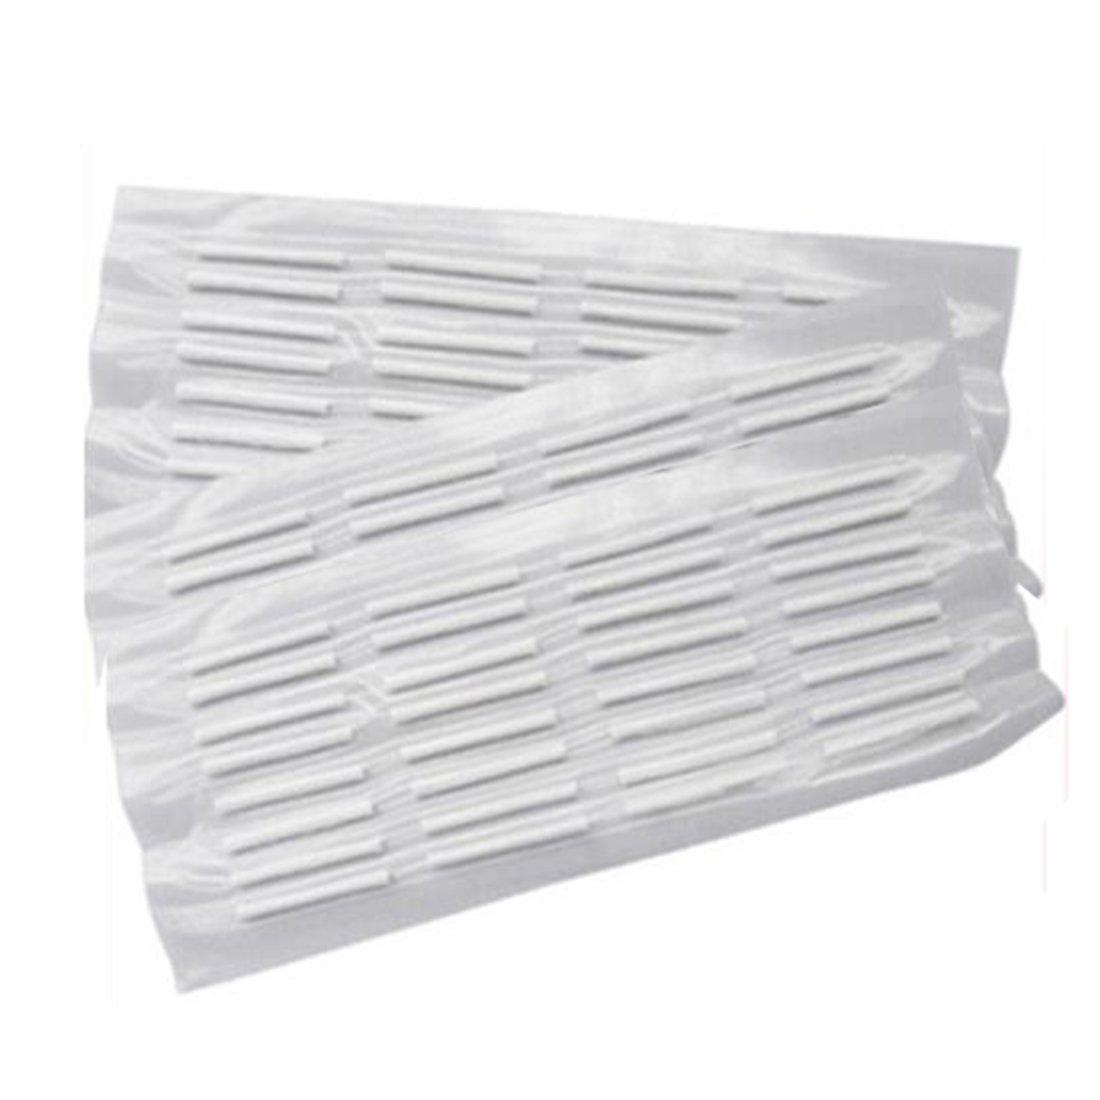 32pcs Wave Perm False Eyelashes Roll Mandrel Medium Rods Curler Sticky Cosmetic L CY-Buity